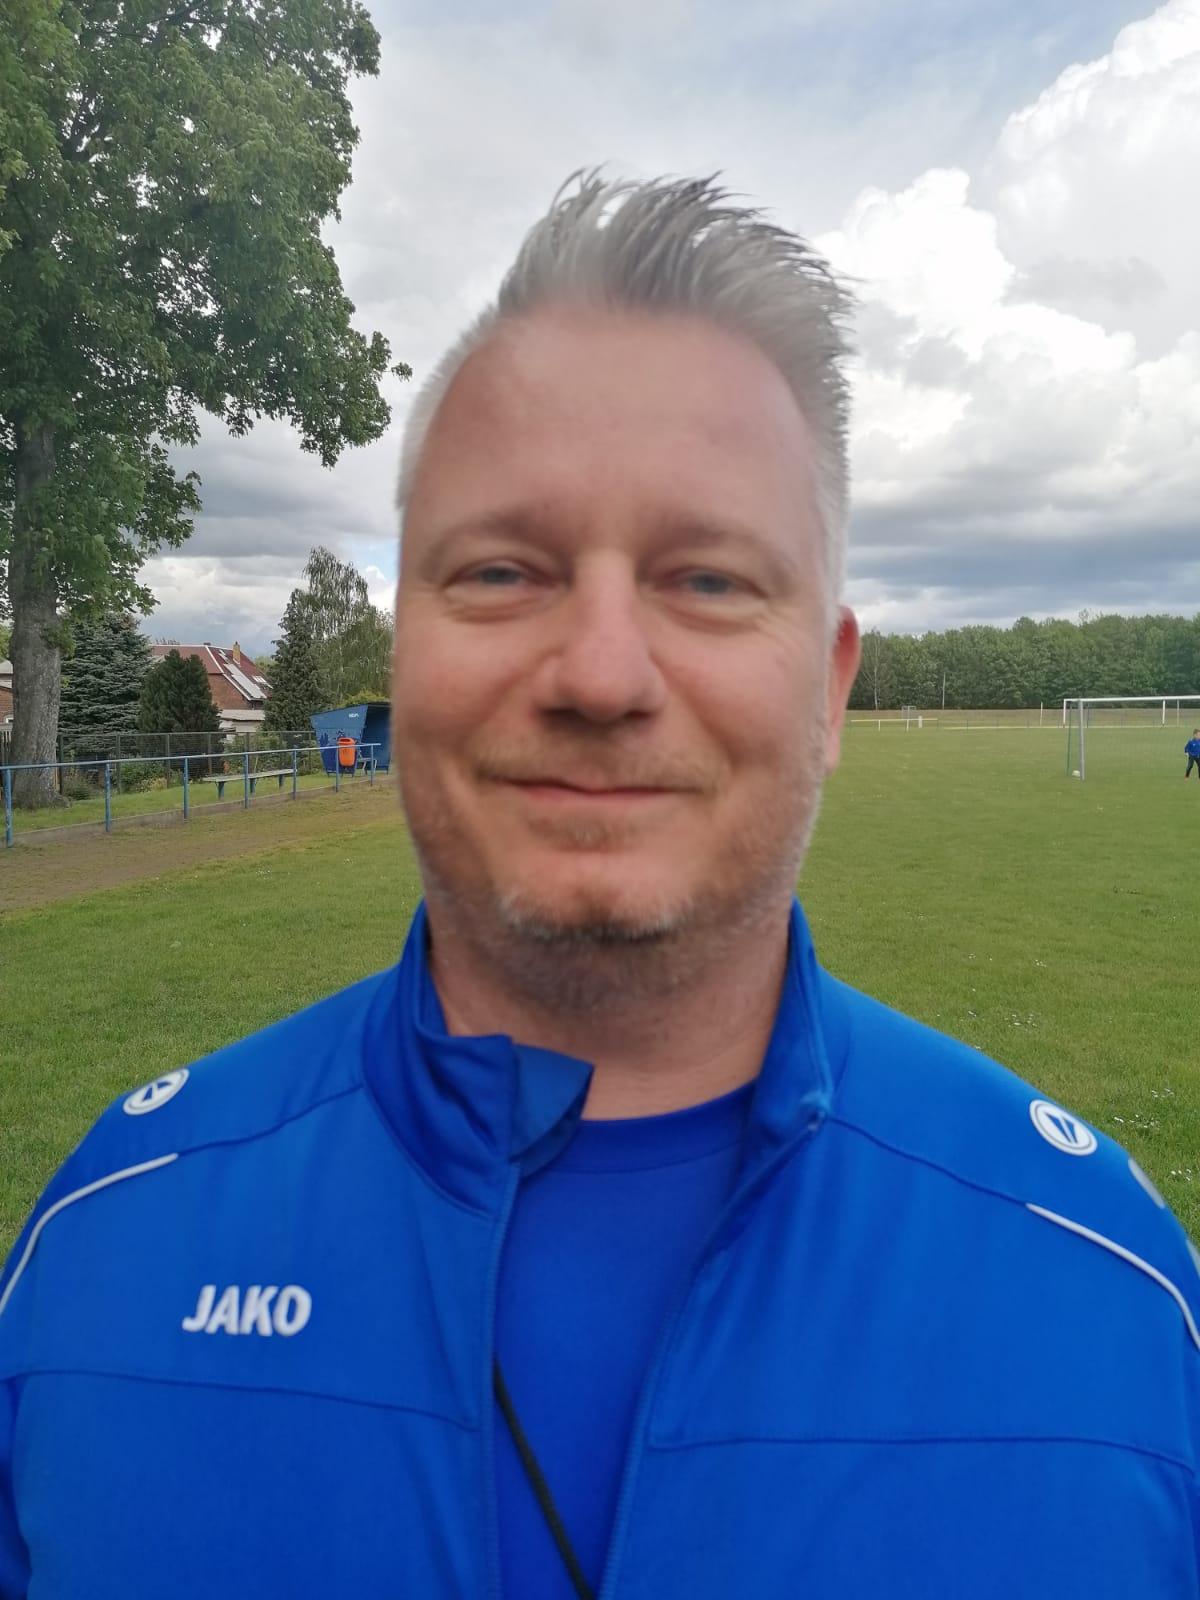 Lars Siegert